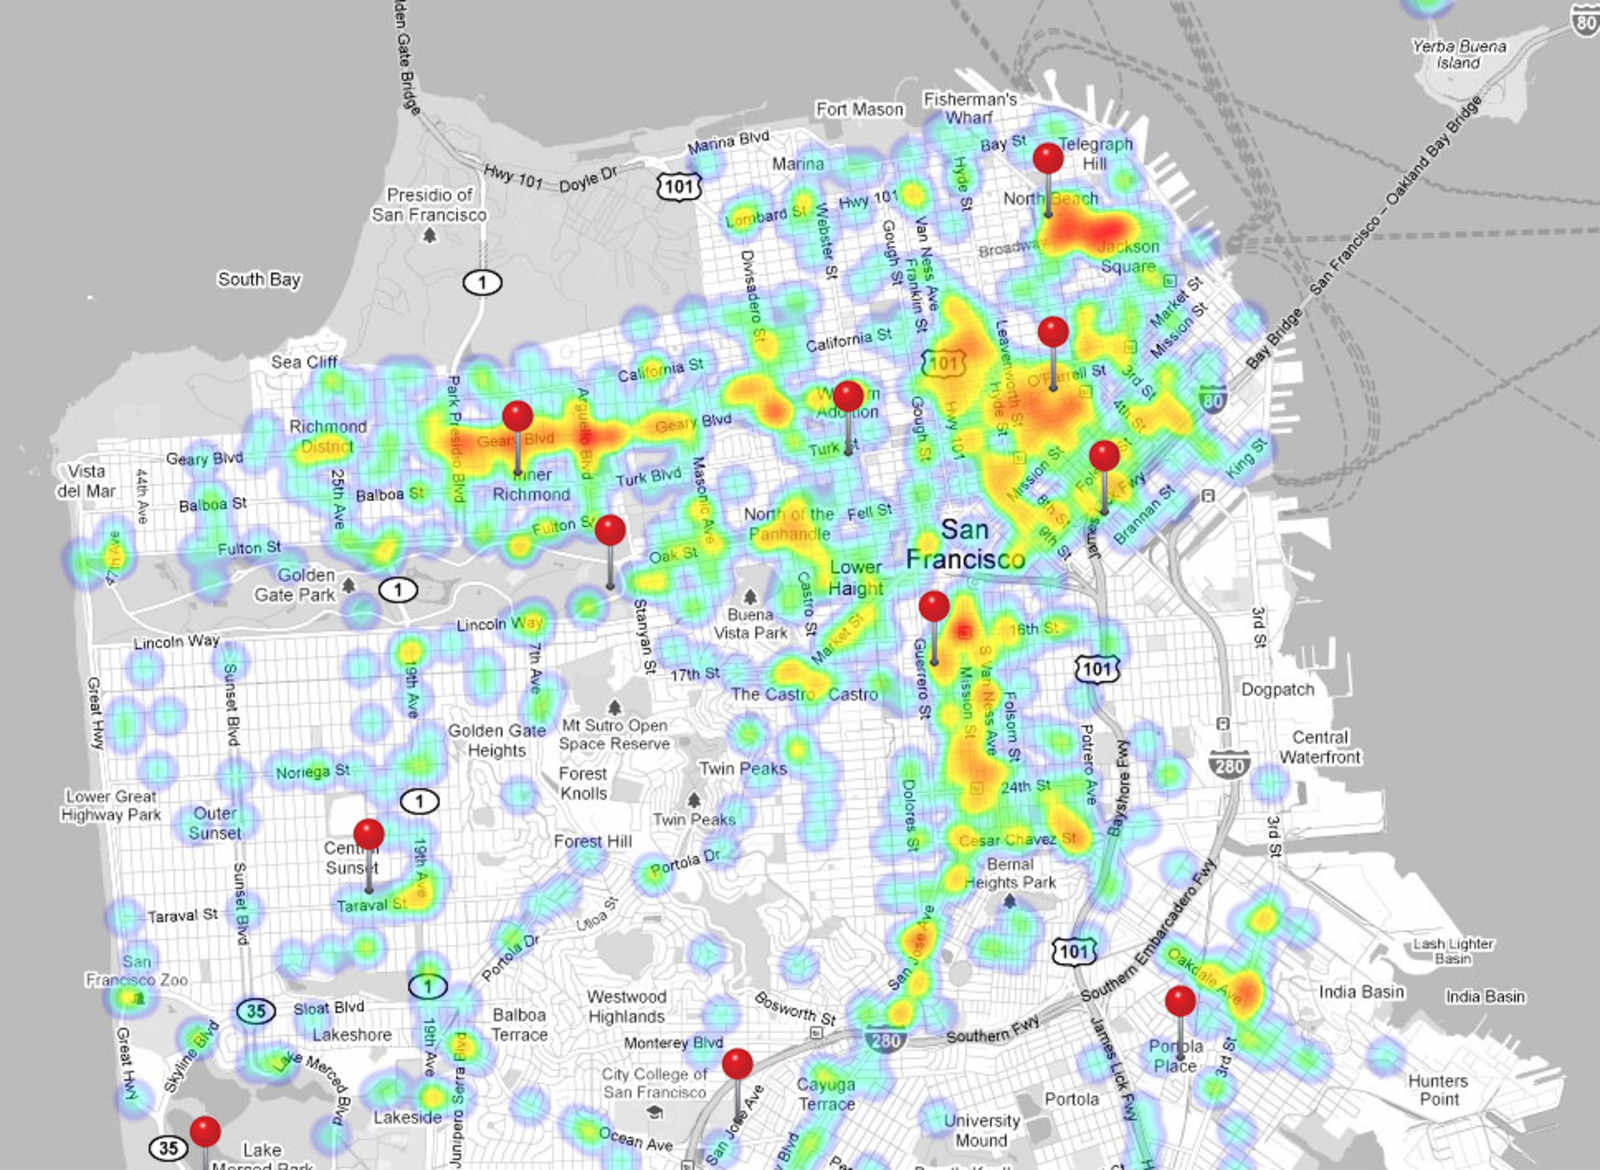 maps Uptown Almanac